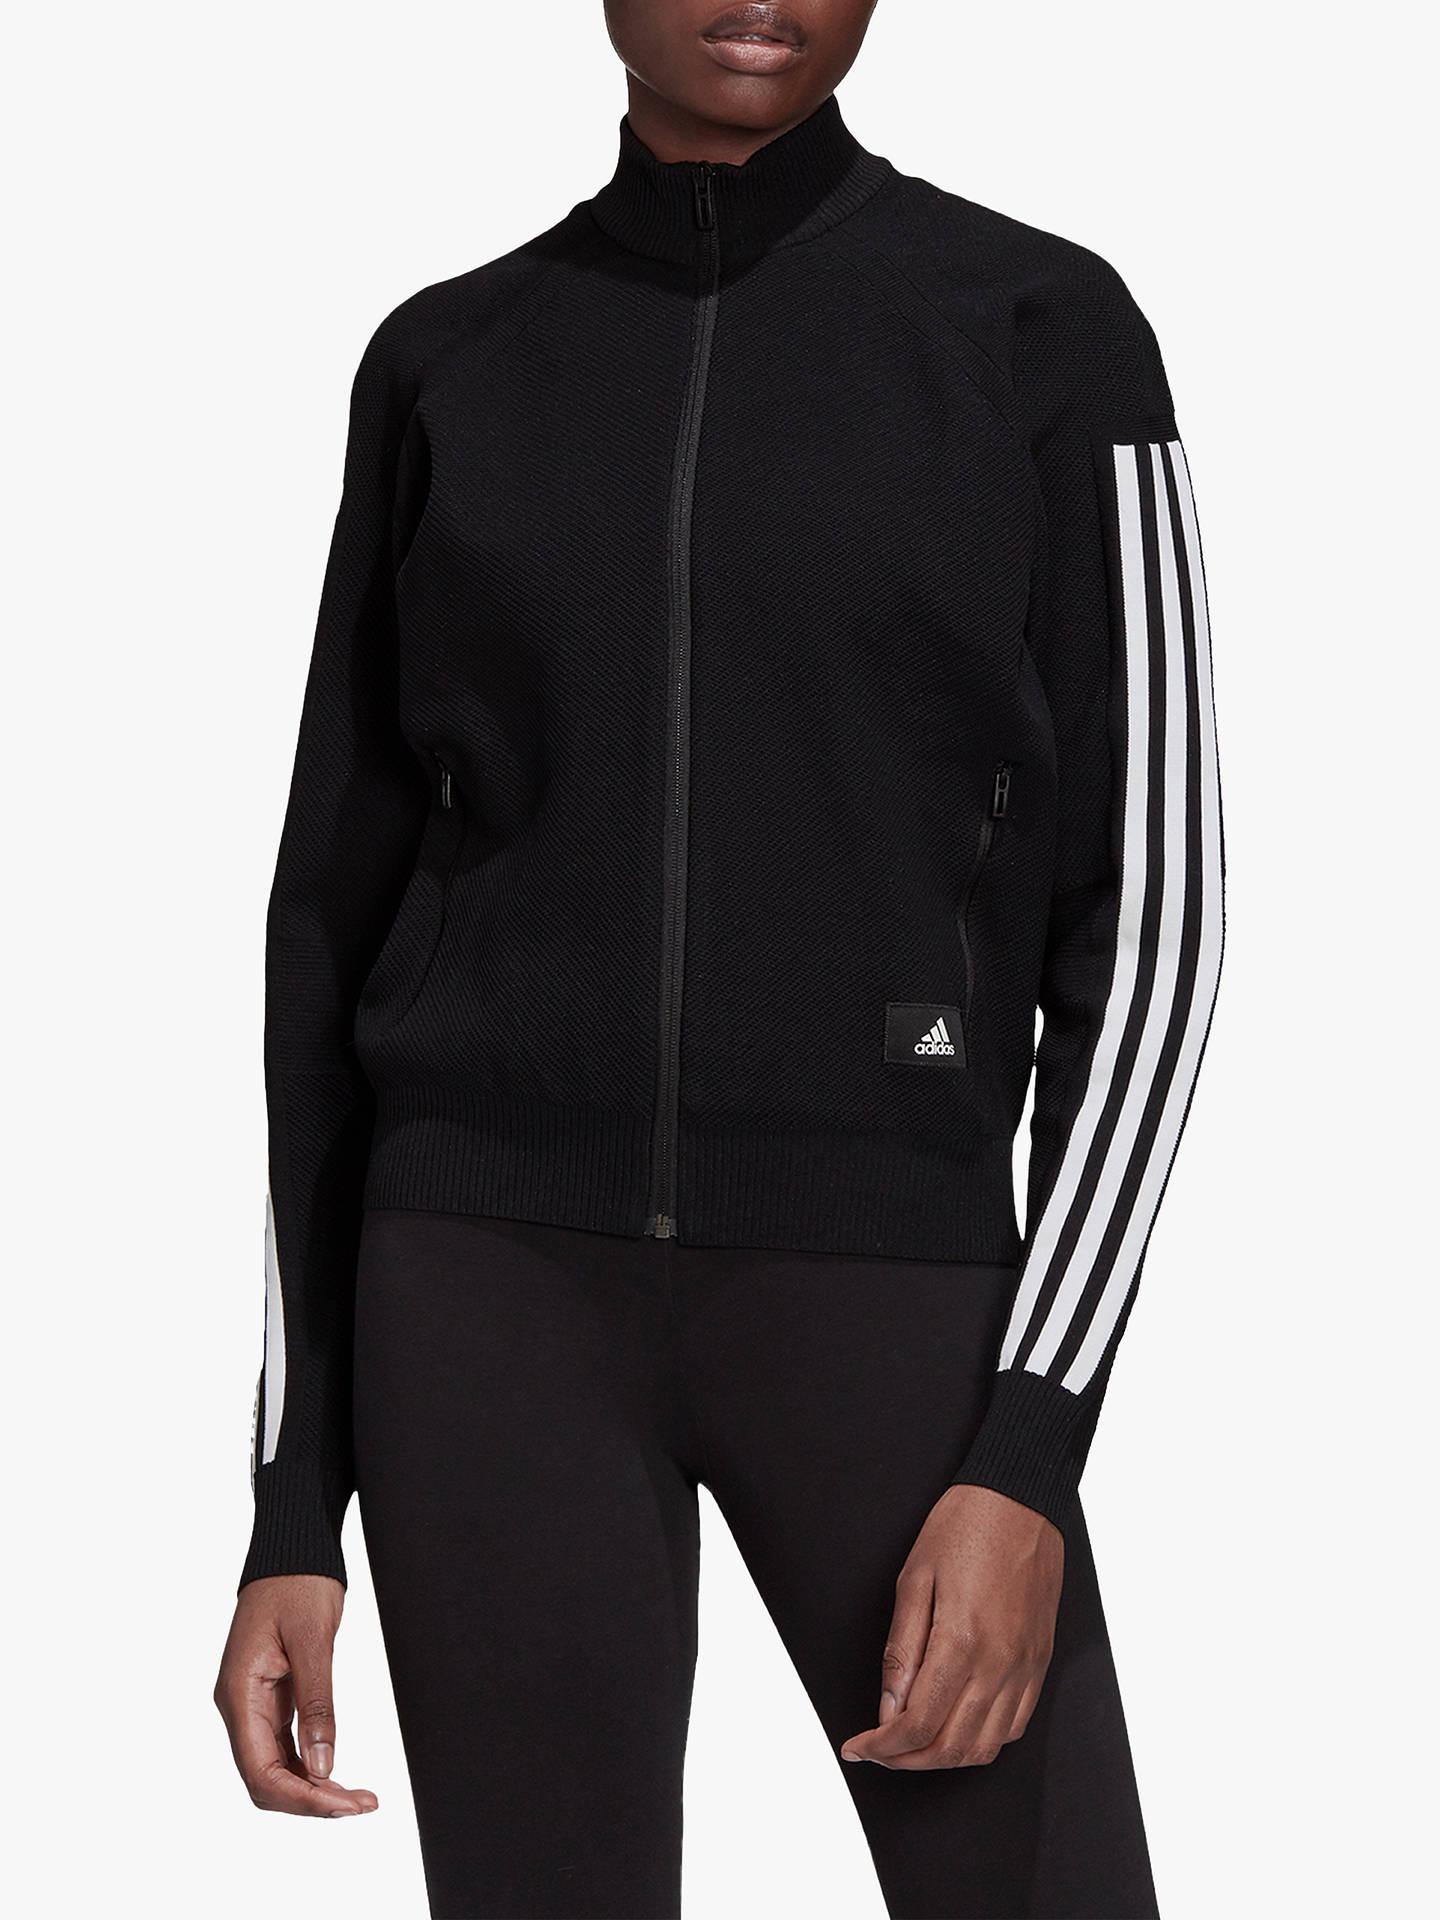 8de272d3 Buy adidas ID Knit Track Top, Black, XS Online at johnlewis.com ...